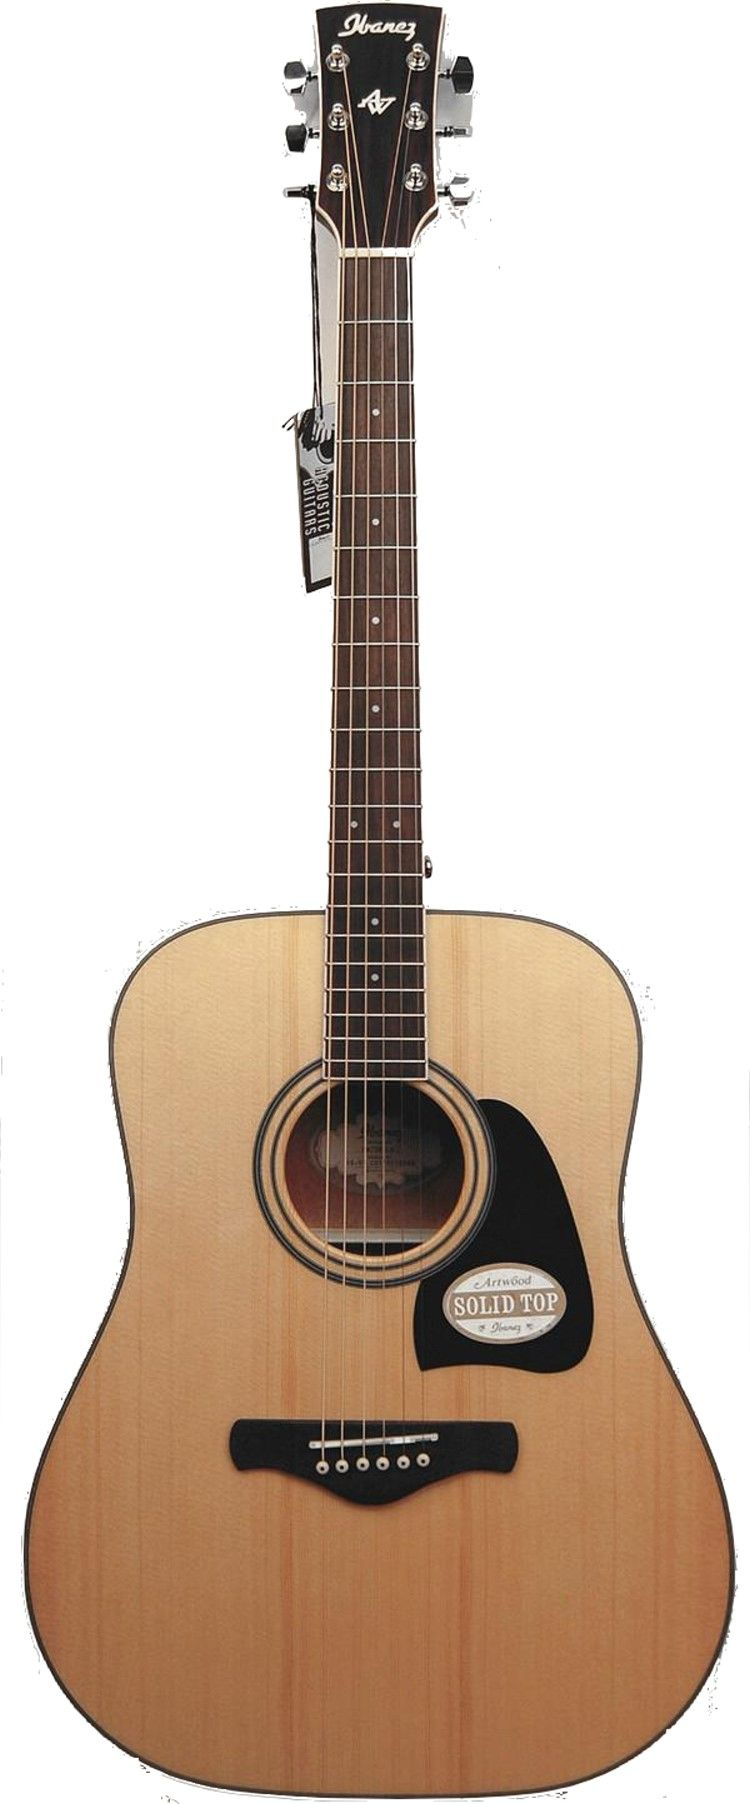 Ibanez AW70-LG AW-70LG 平光單板木吉他(民謠吉他)